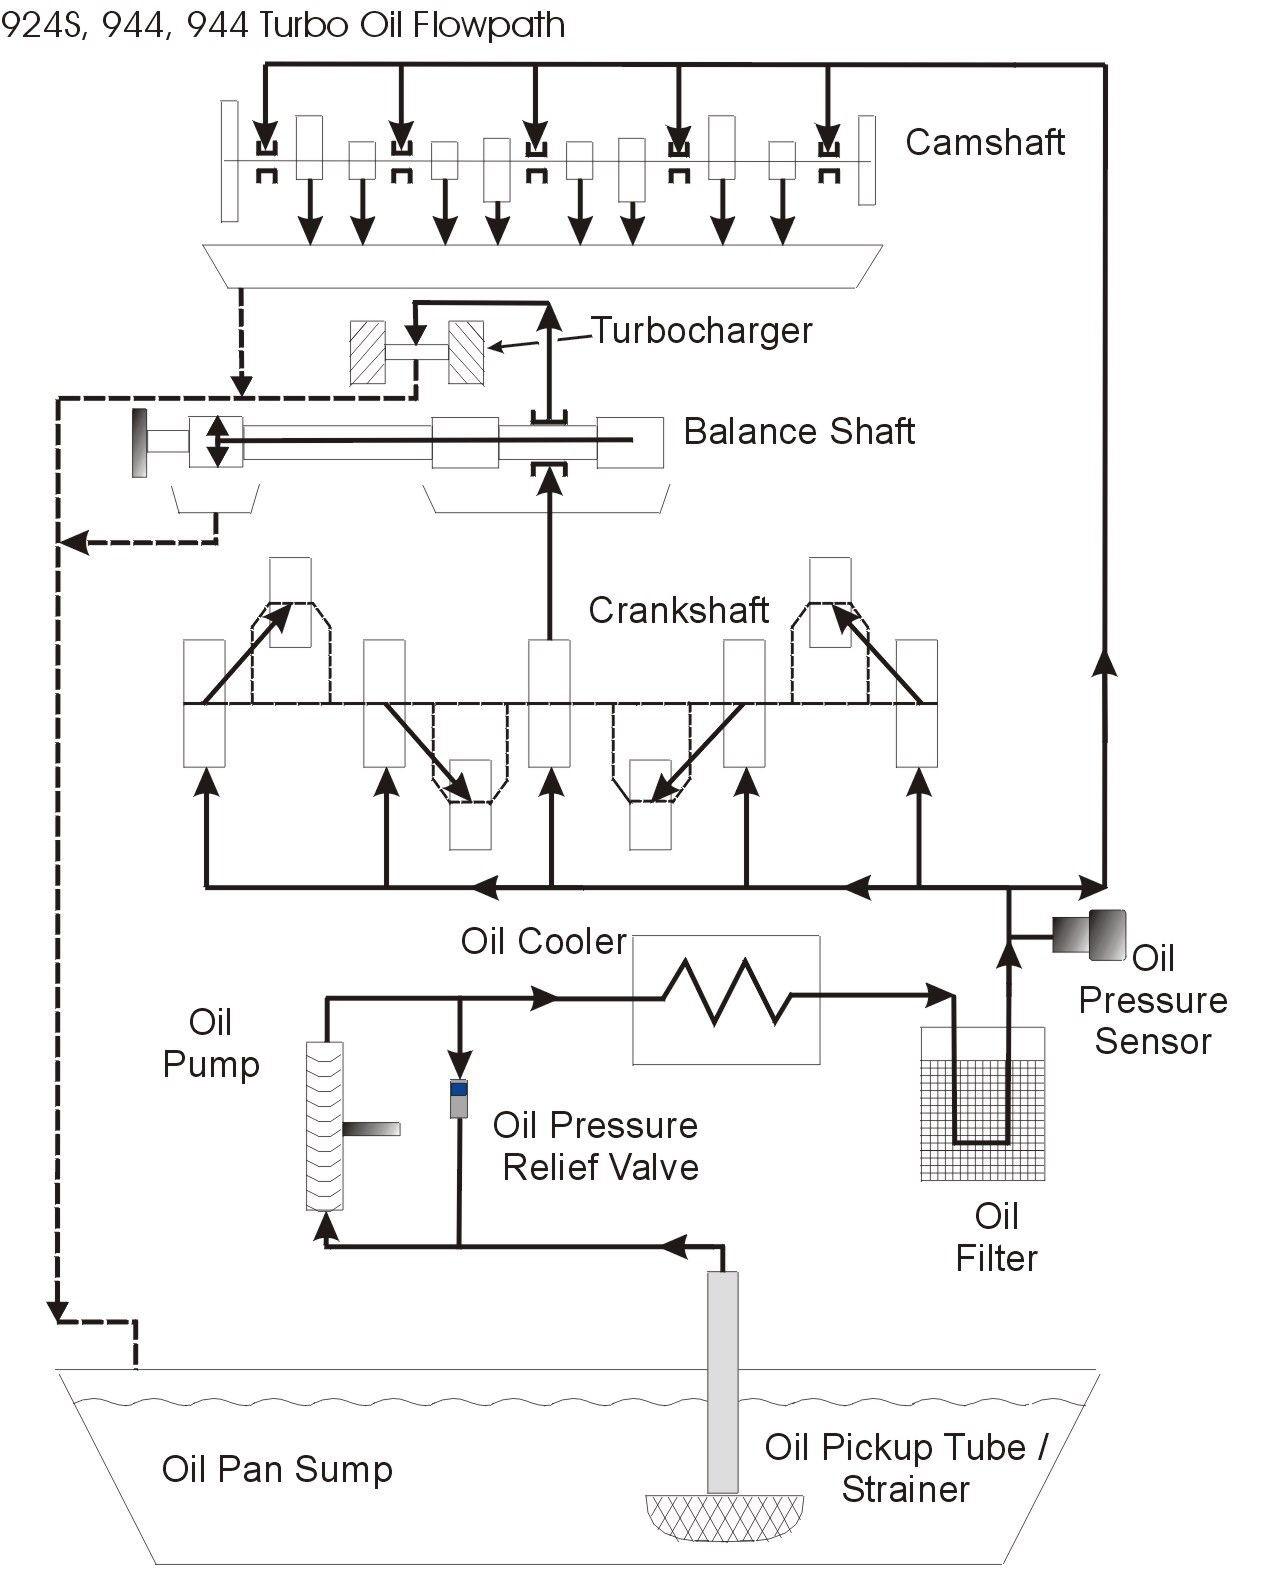 Diagram Of A Turbo Porsche 944 Engine Oil Flow Porsche Transaxles Pinterest Of Diagram Of A Turbo